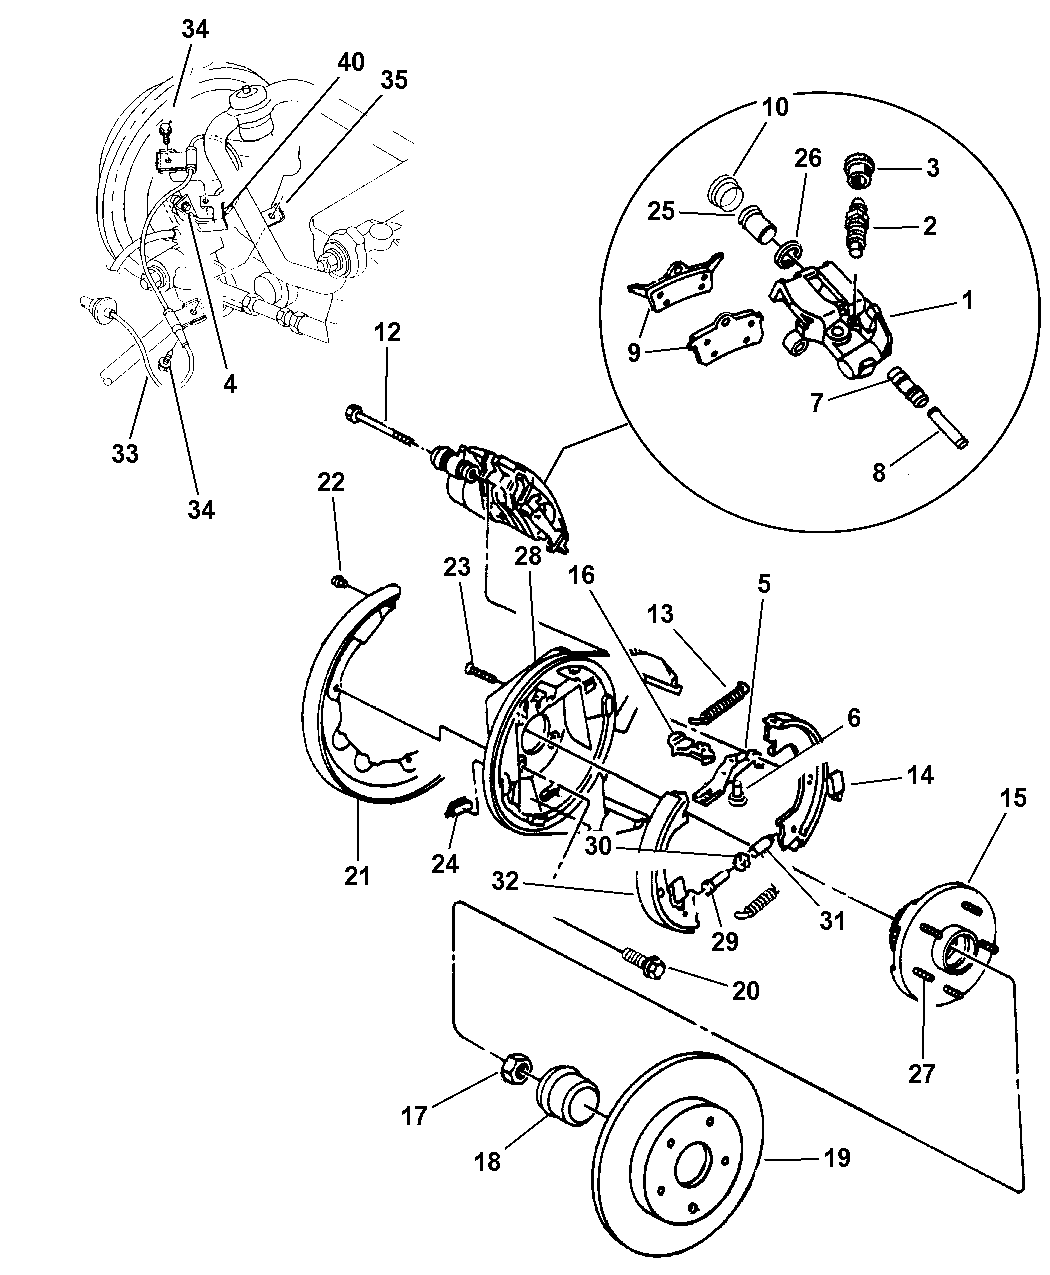 1997 Chrysler Sebring Convertible Brakes, Rear Disc